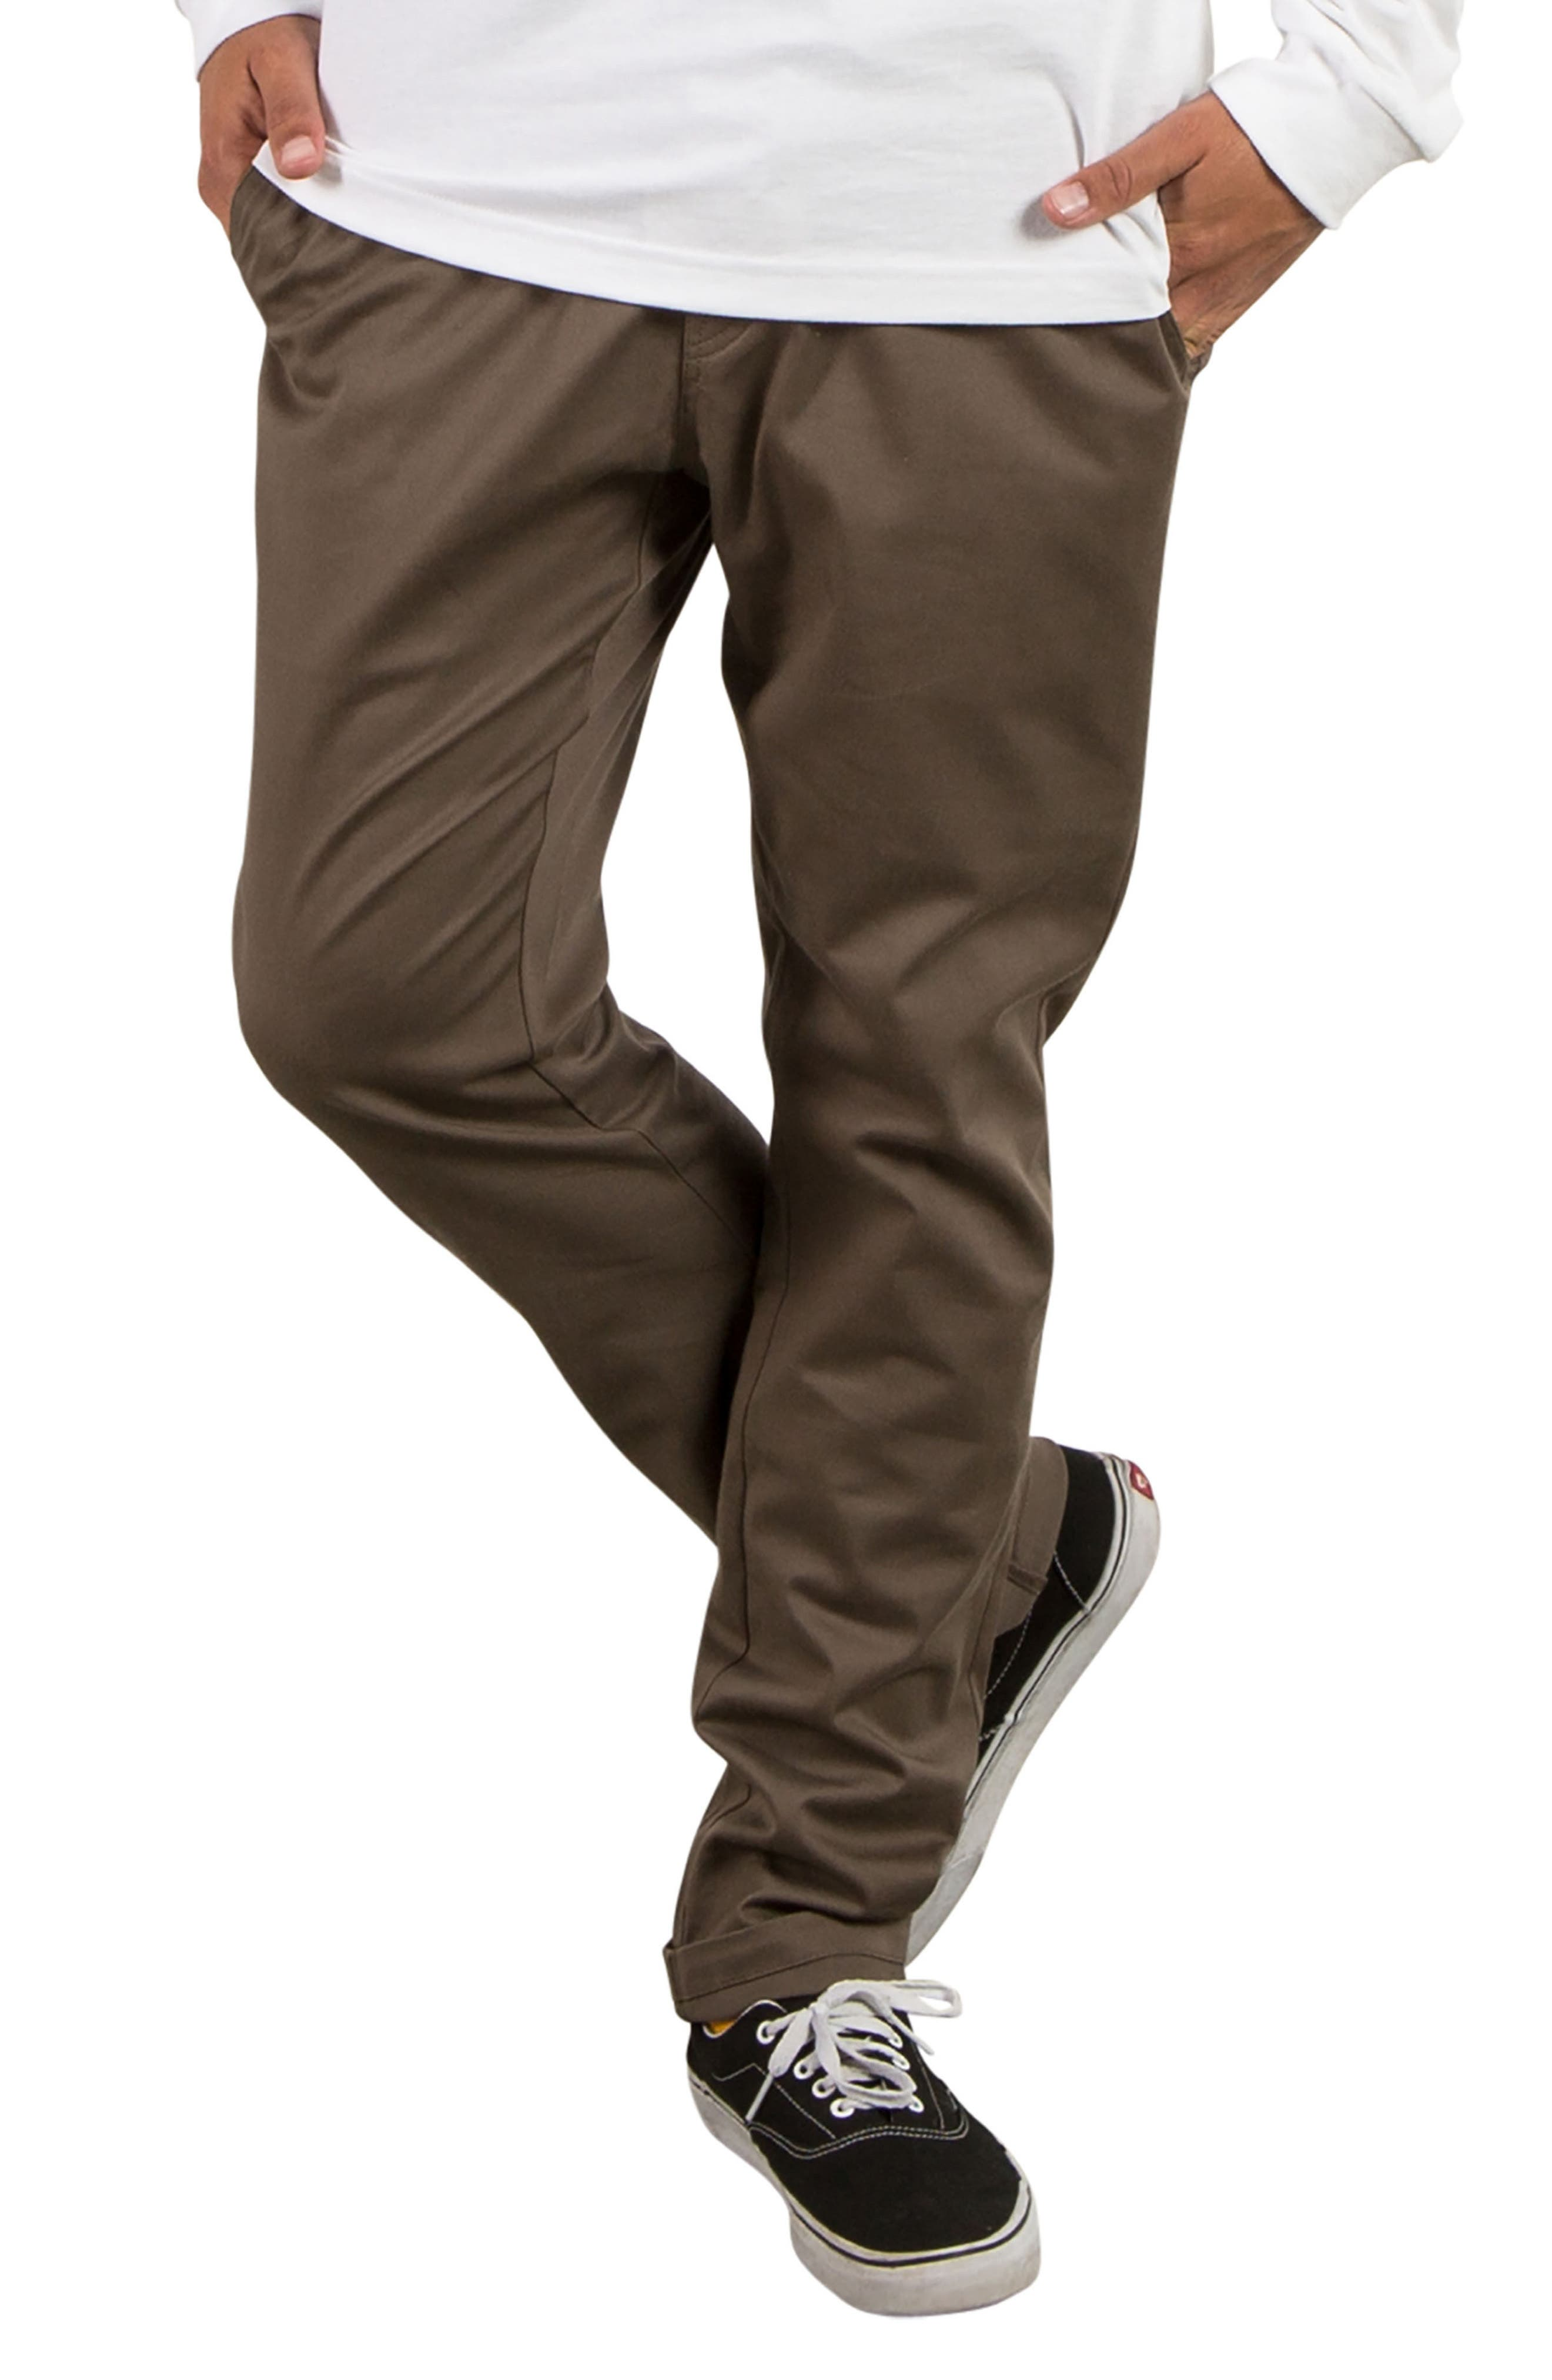 Comfort Chino Pants,                         Main,                         color, Mushroom